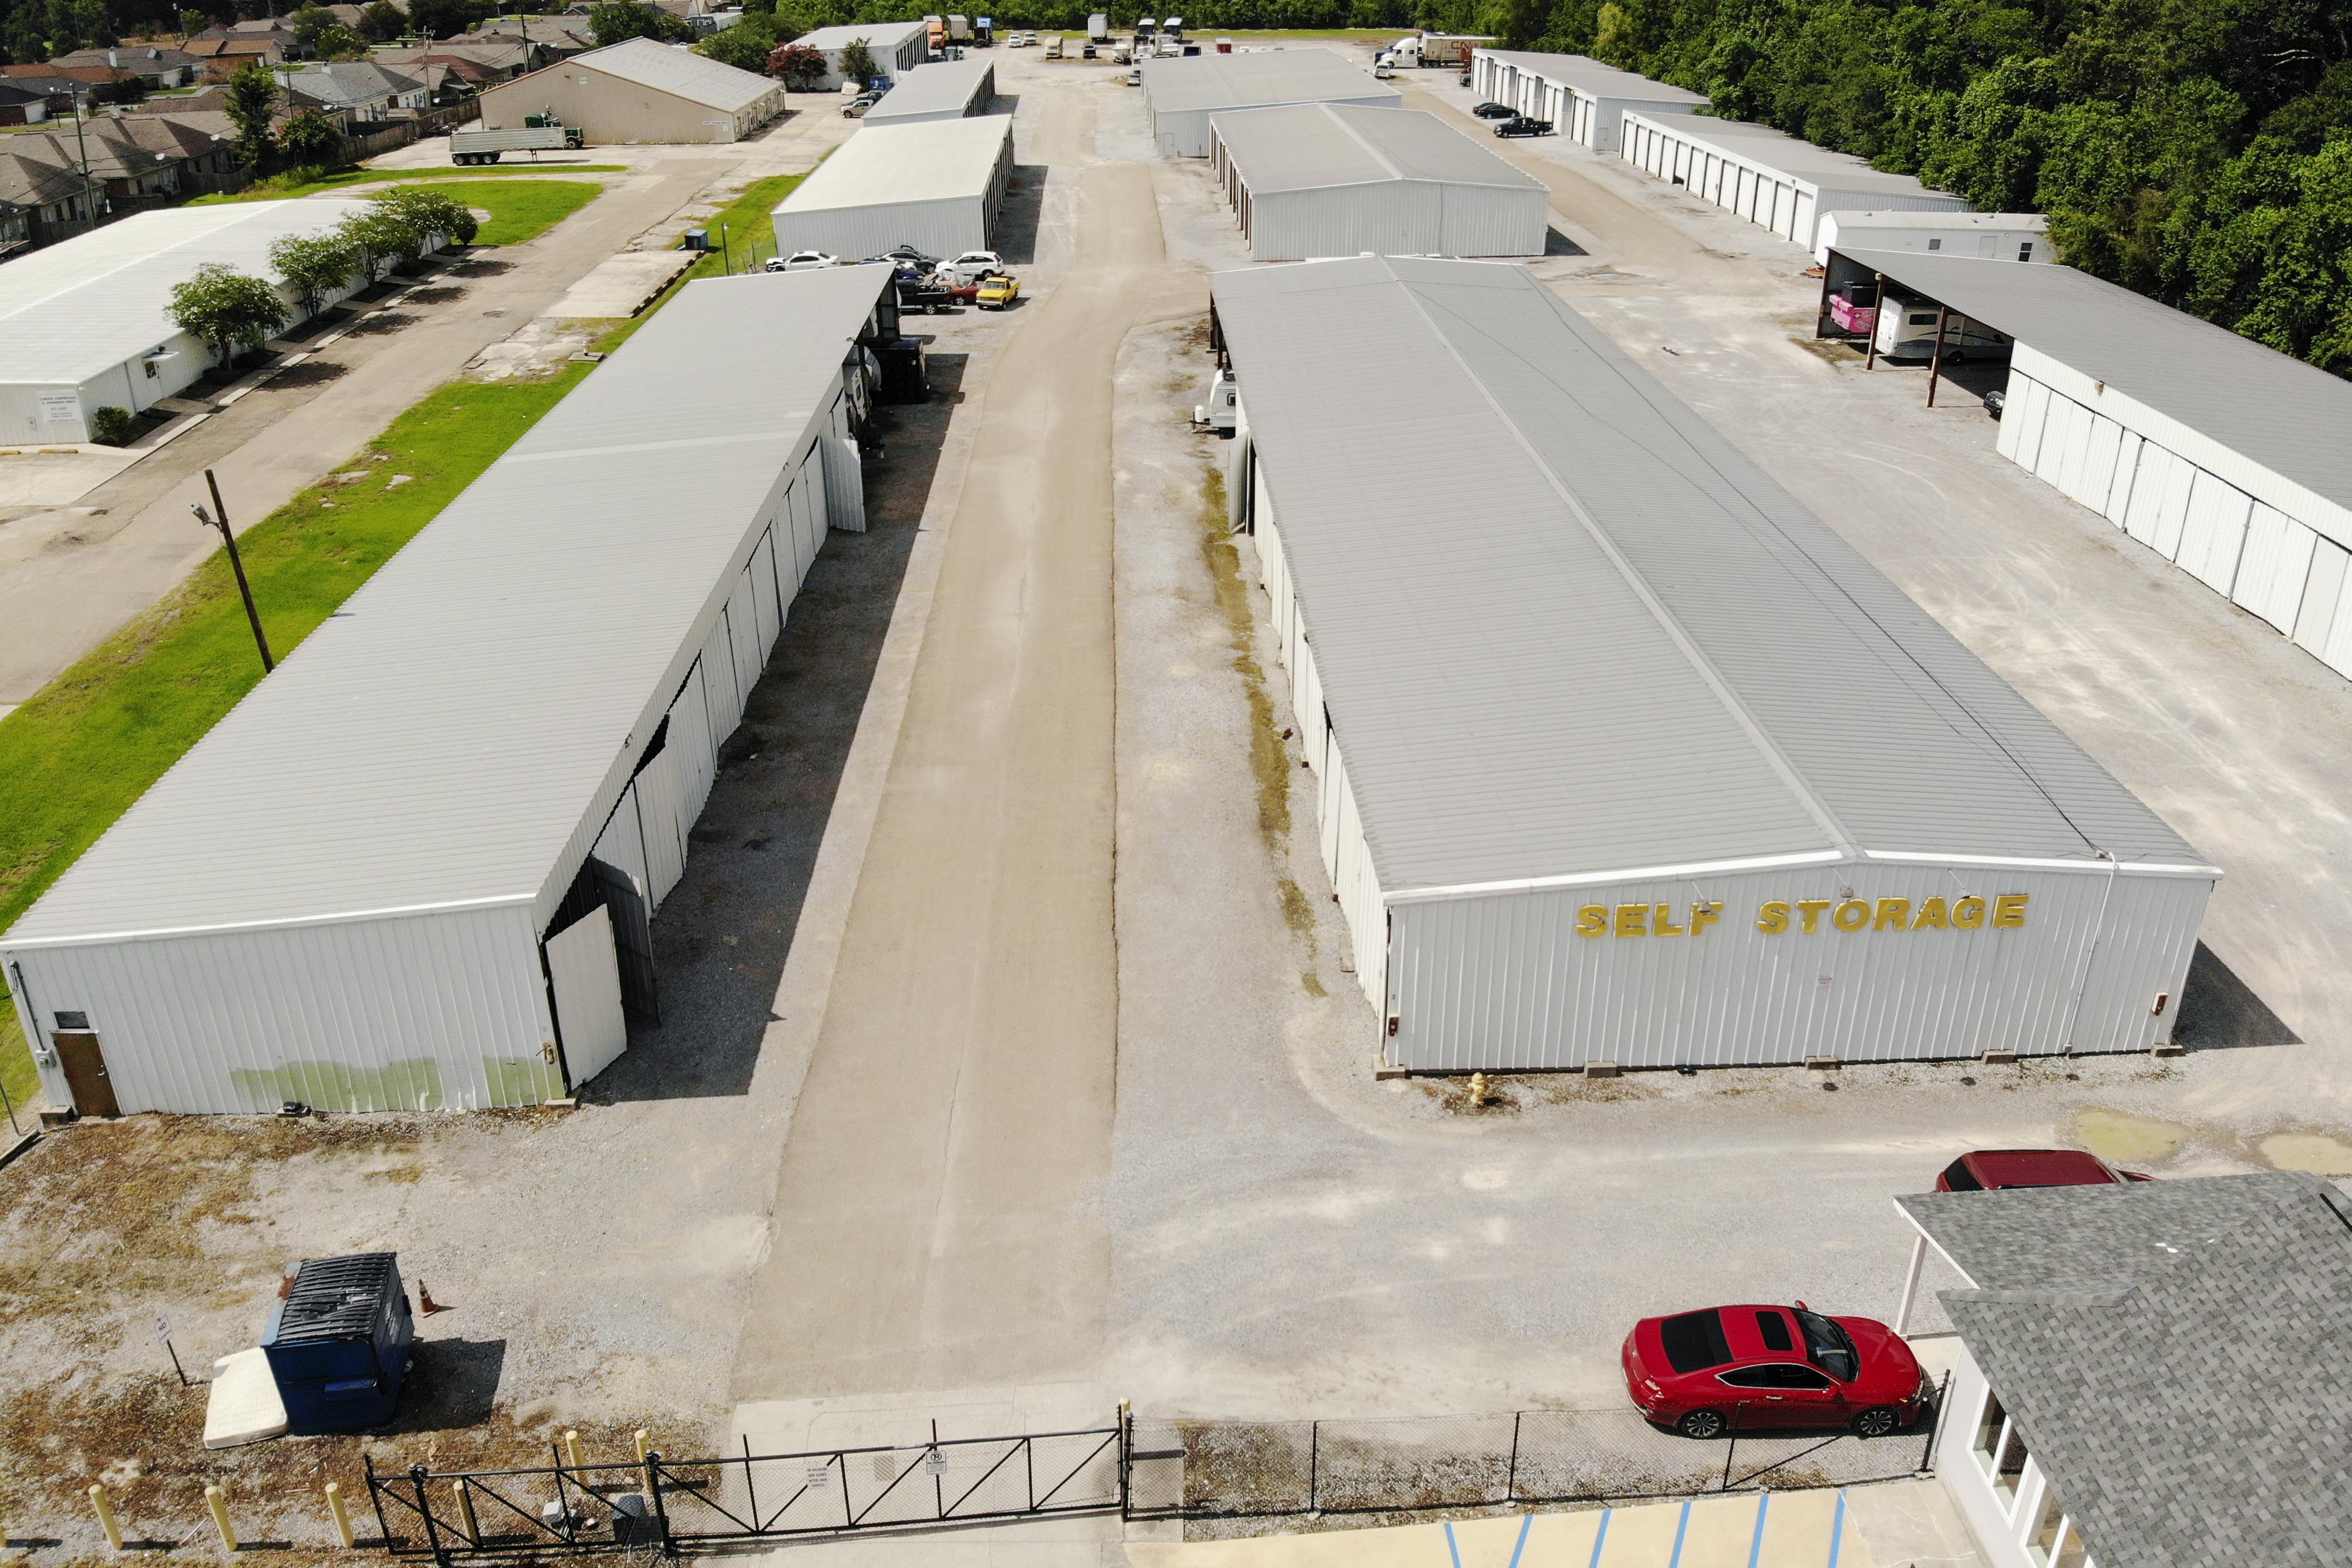 Self storage in Baton Rouge, LA